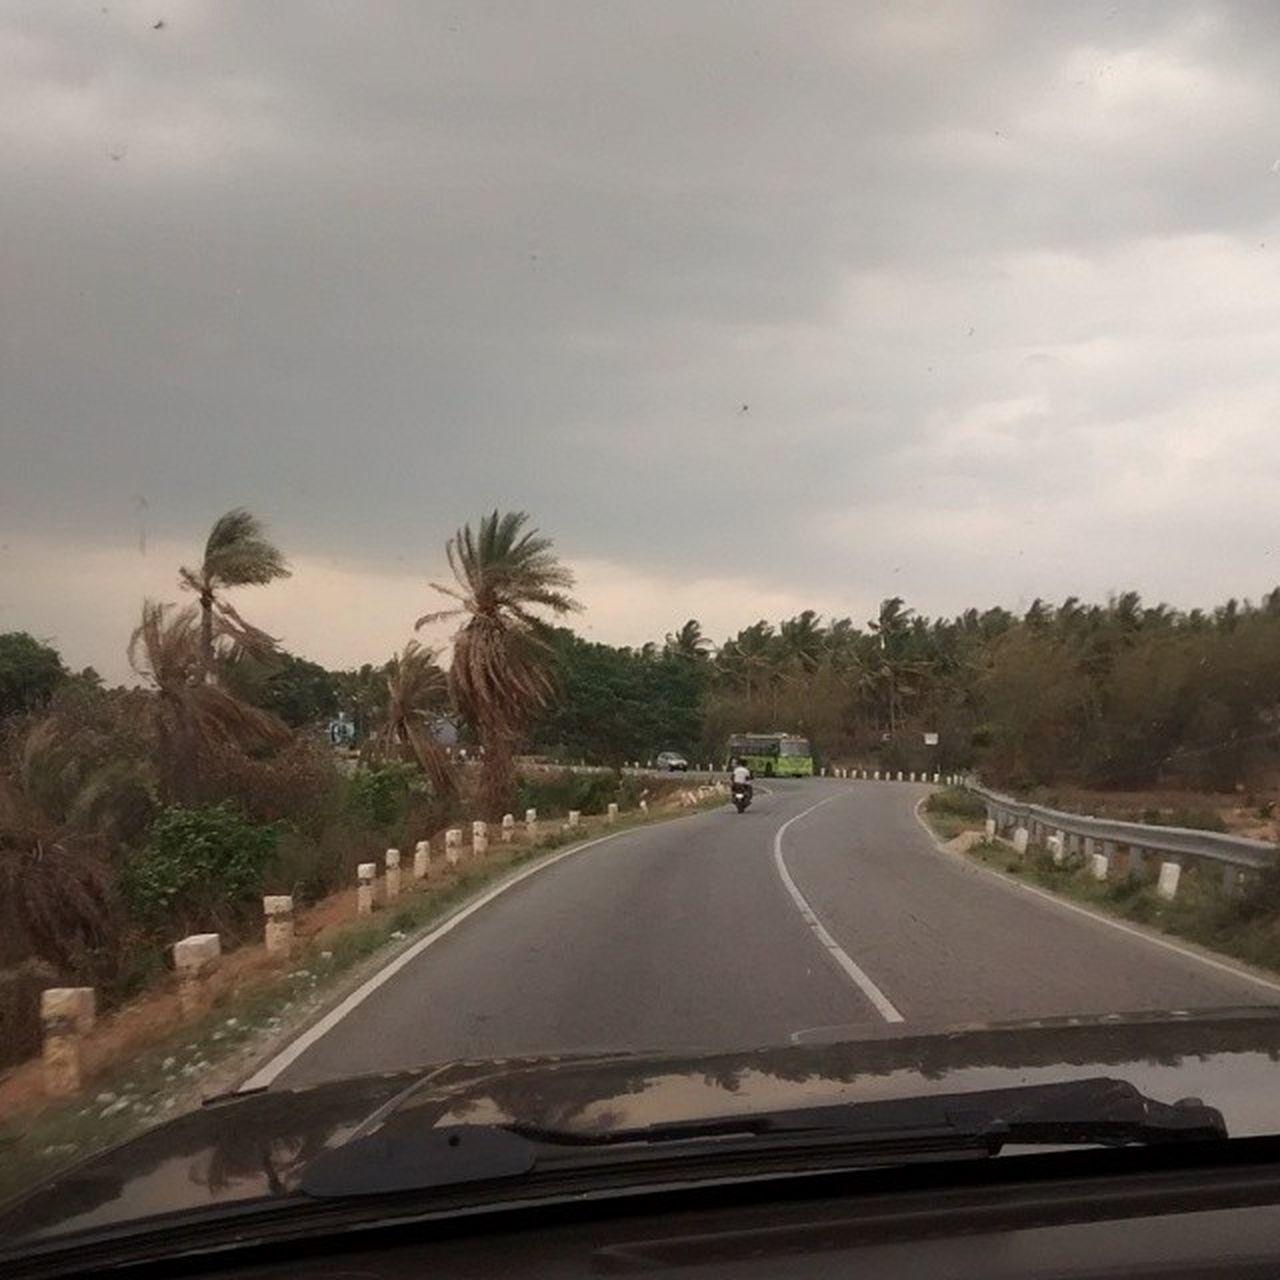 The hunt for a new trail. Leg 3. Kanakpura IndiaTrail Huntforanewtrail Bangalore to Masinagudi Nissan Safari Pouring Rain Clouds